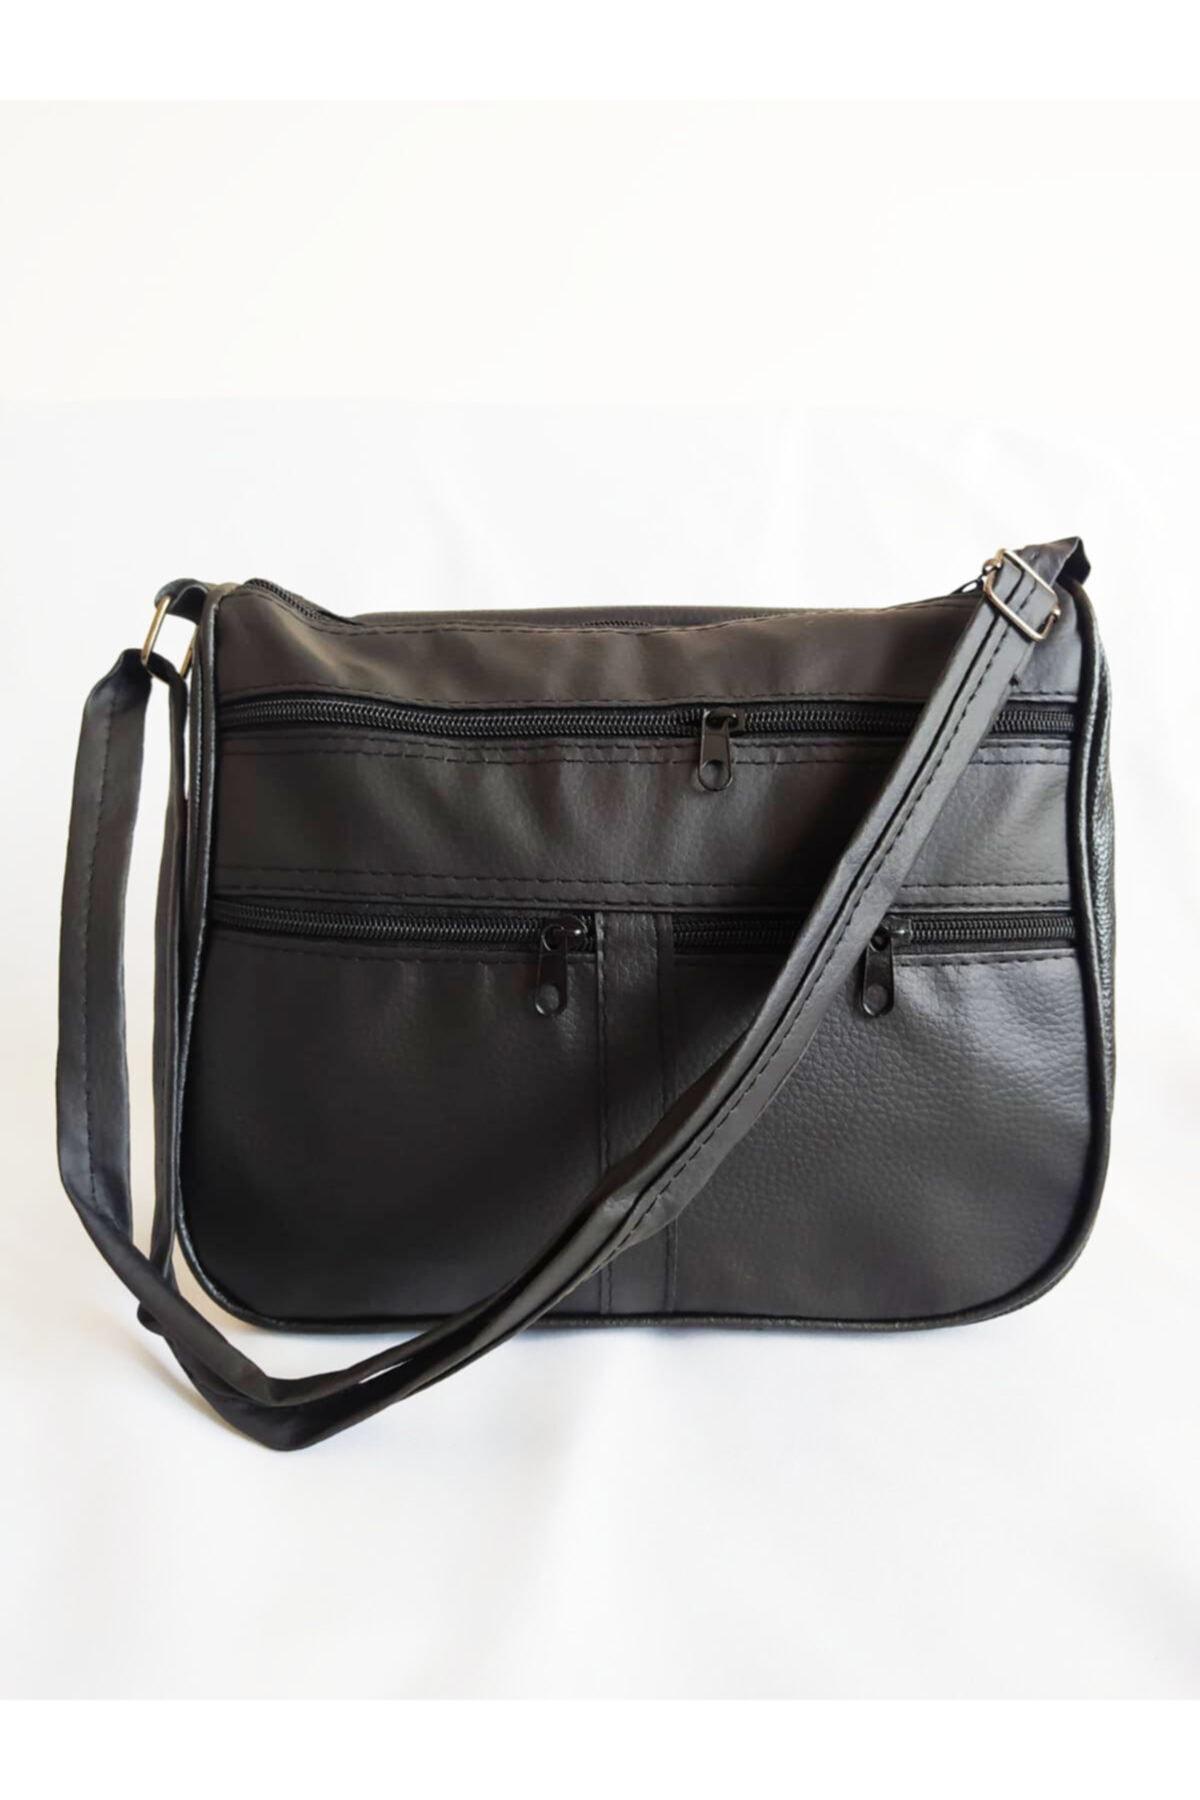 Sheilann Siyah Çapraz Kapaklı Çanta 2